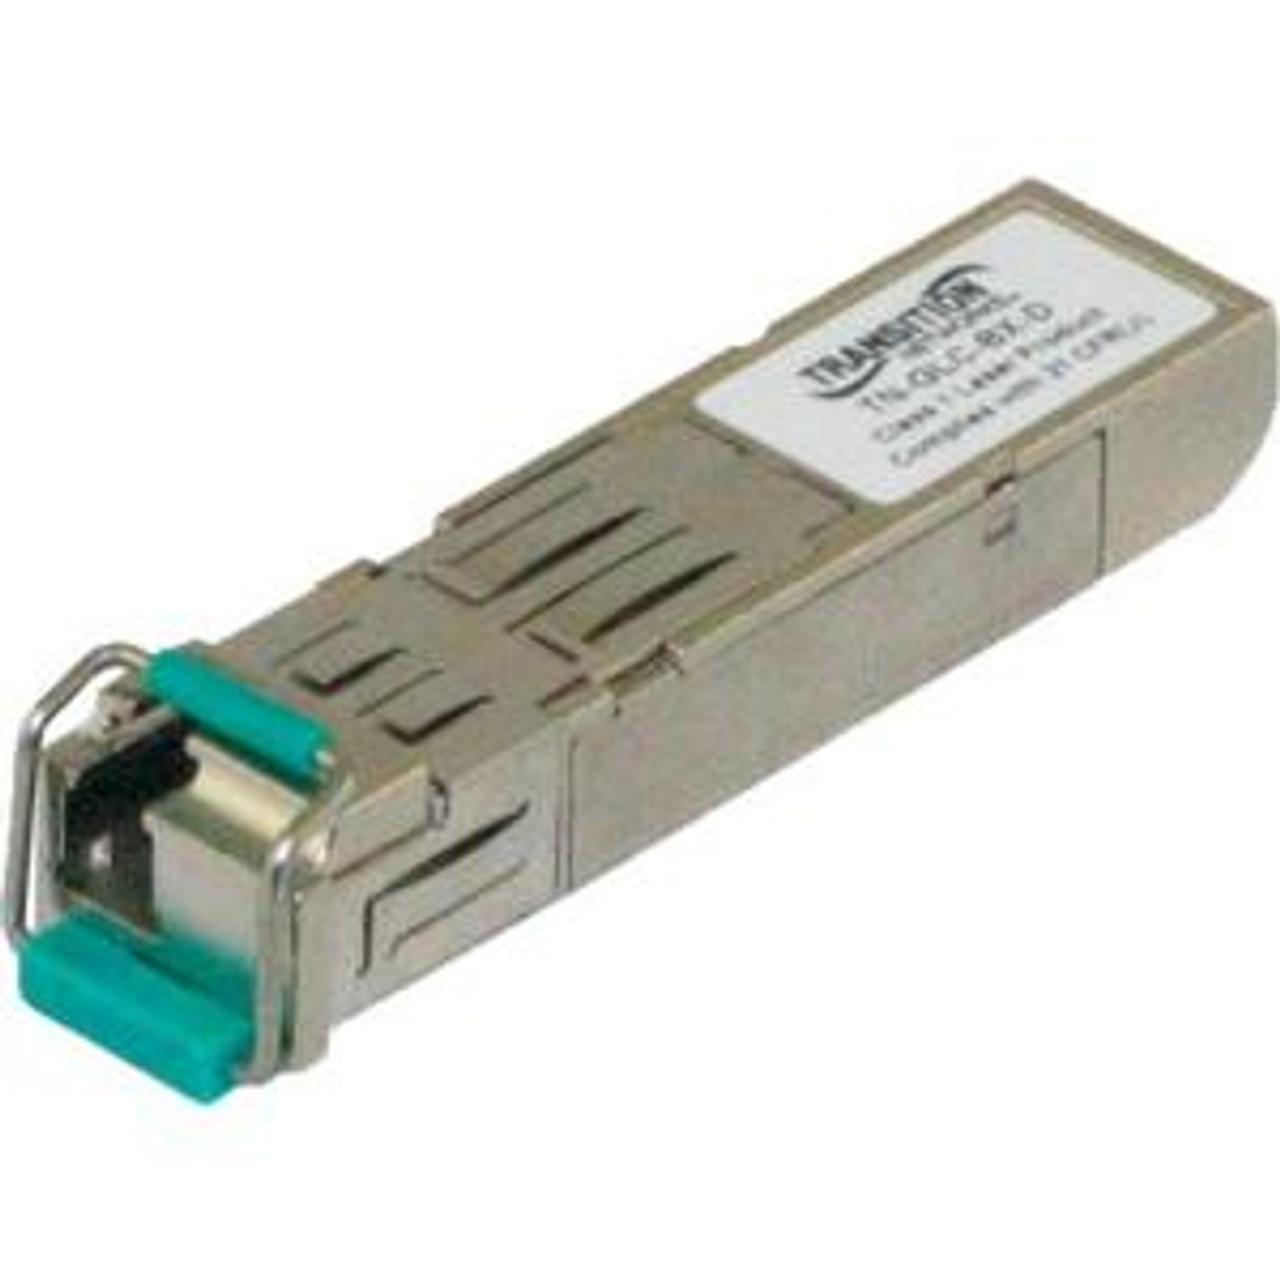 mini-GBIC Transition Networks SFP Module TN-GLC-SX-MM-2K-RGD